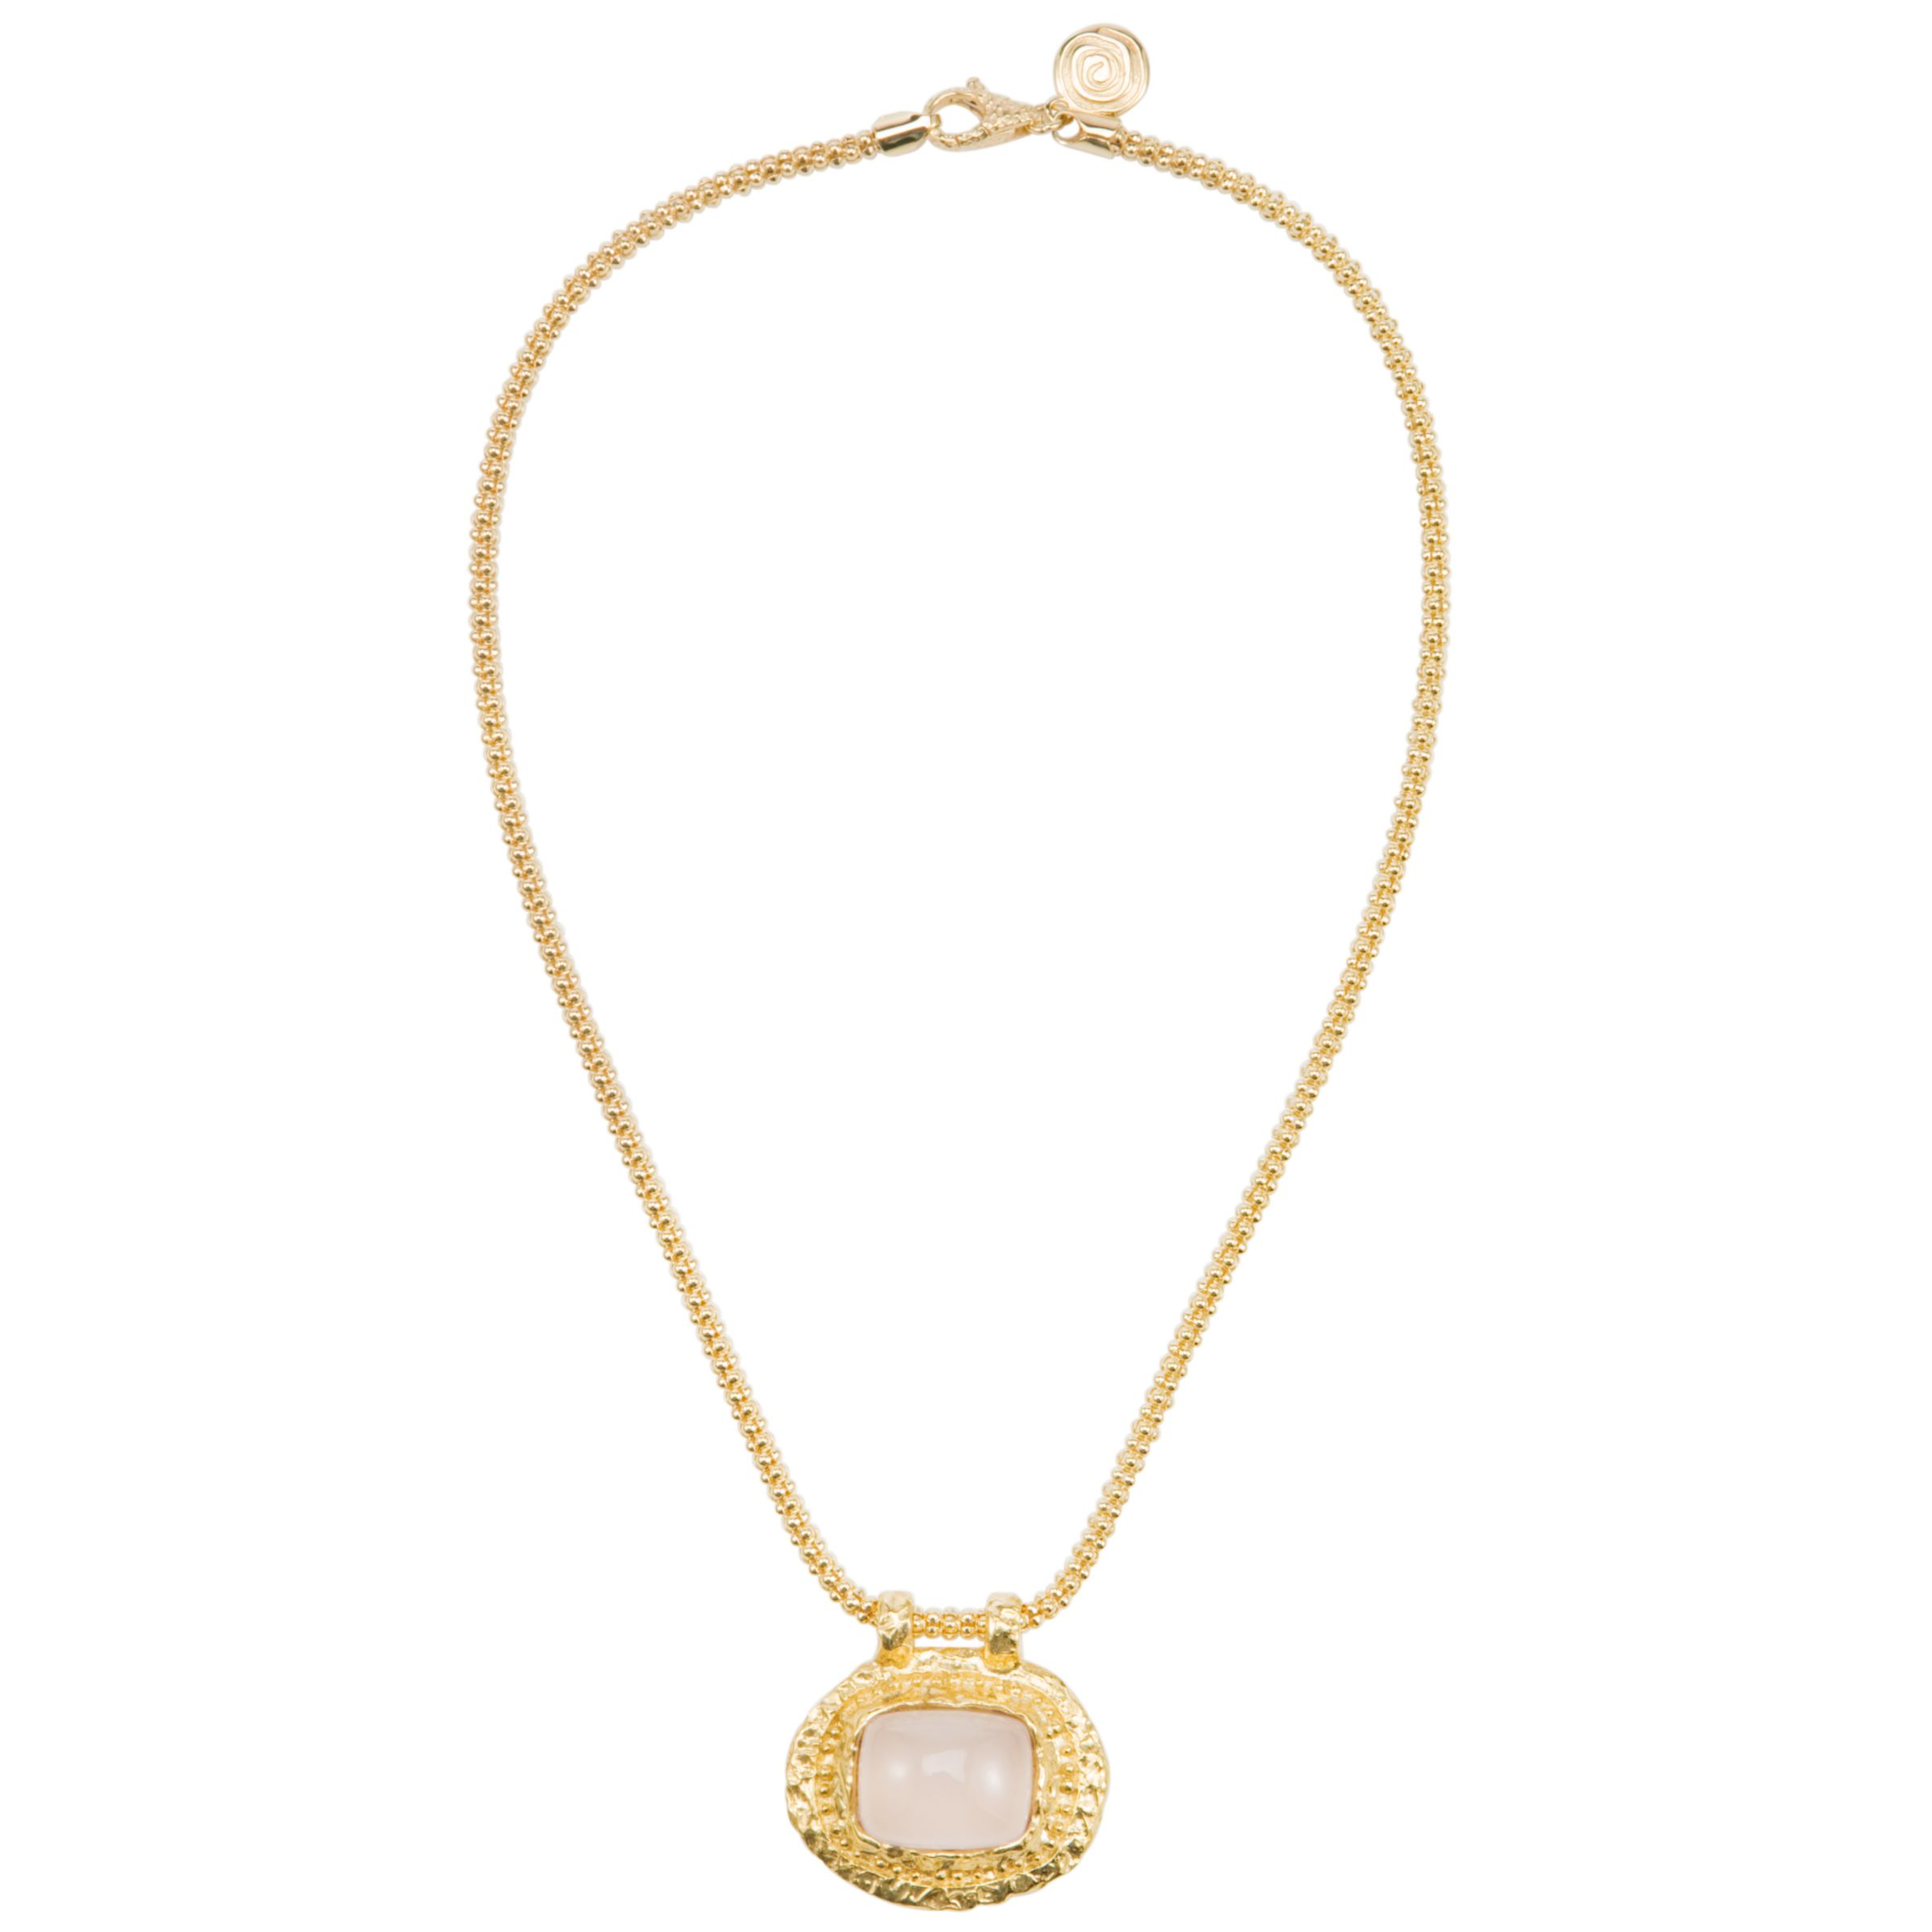 Etrusca Hammered Slide Disc Rose Quartz Pendant Necklace